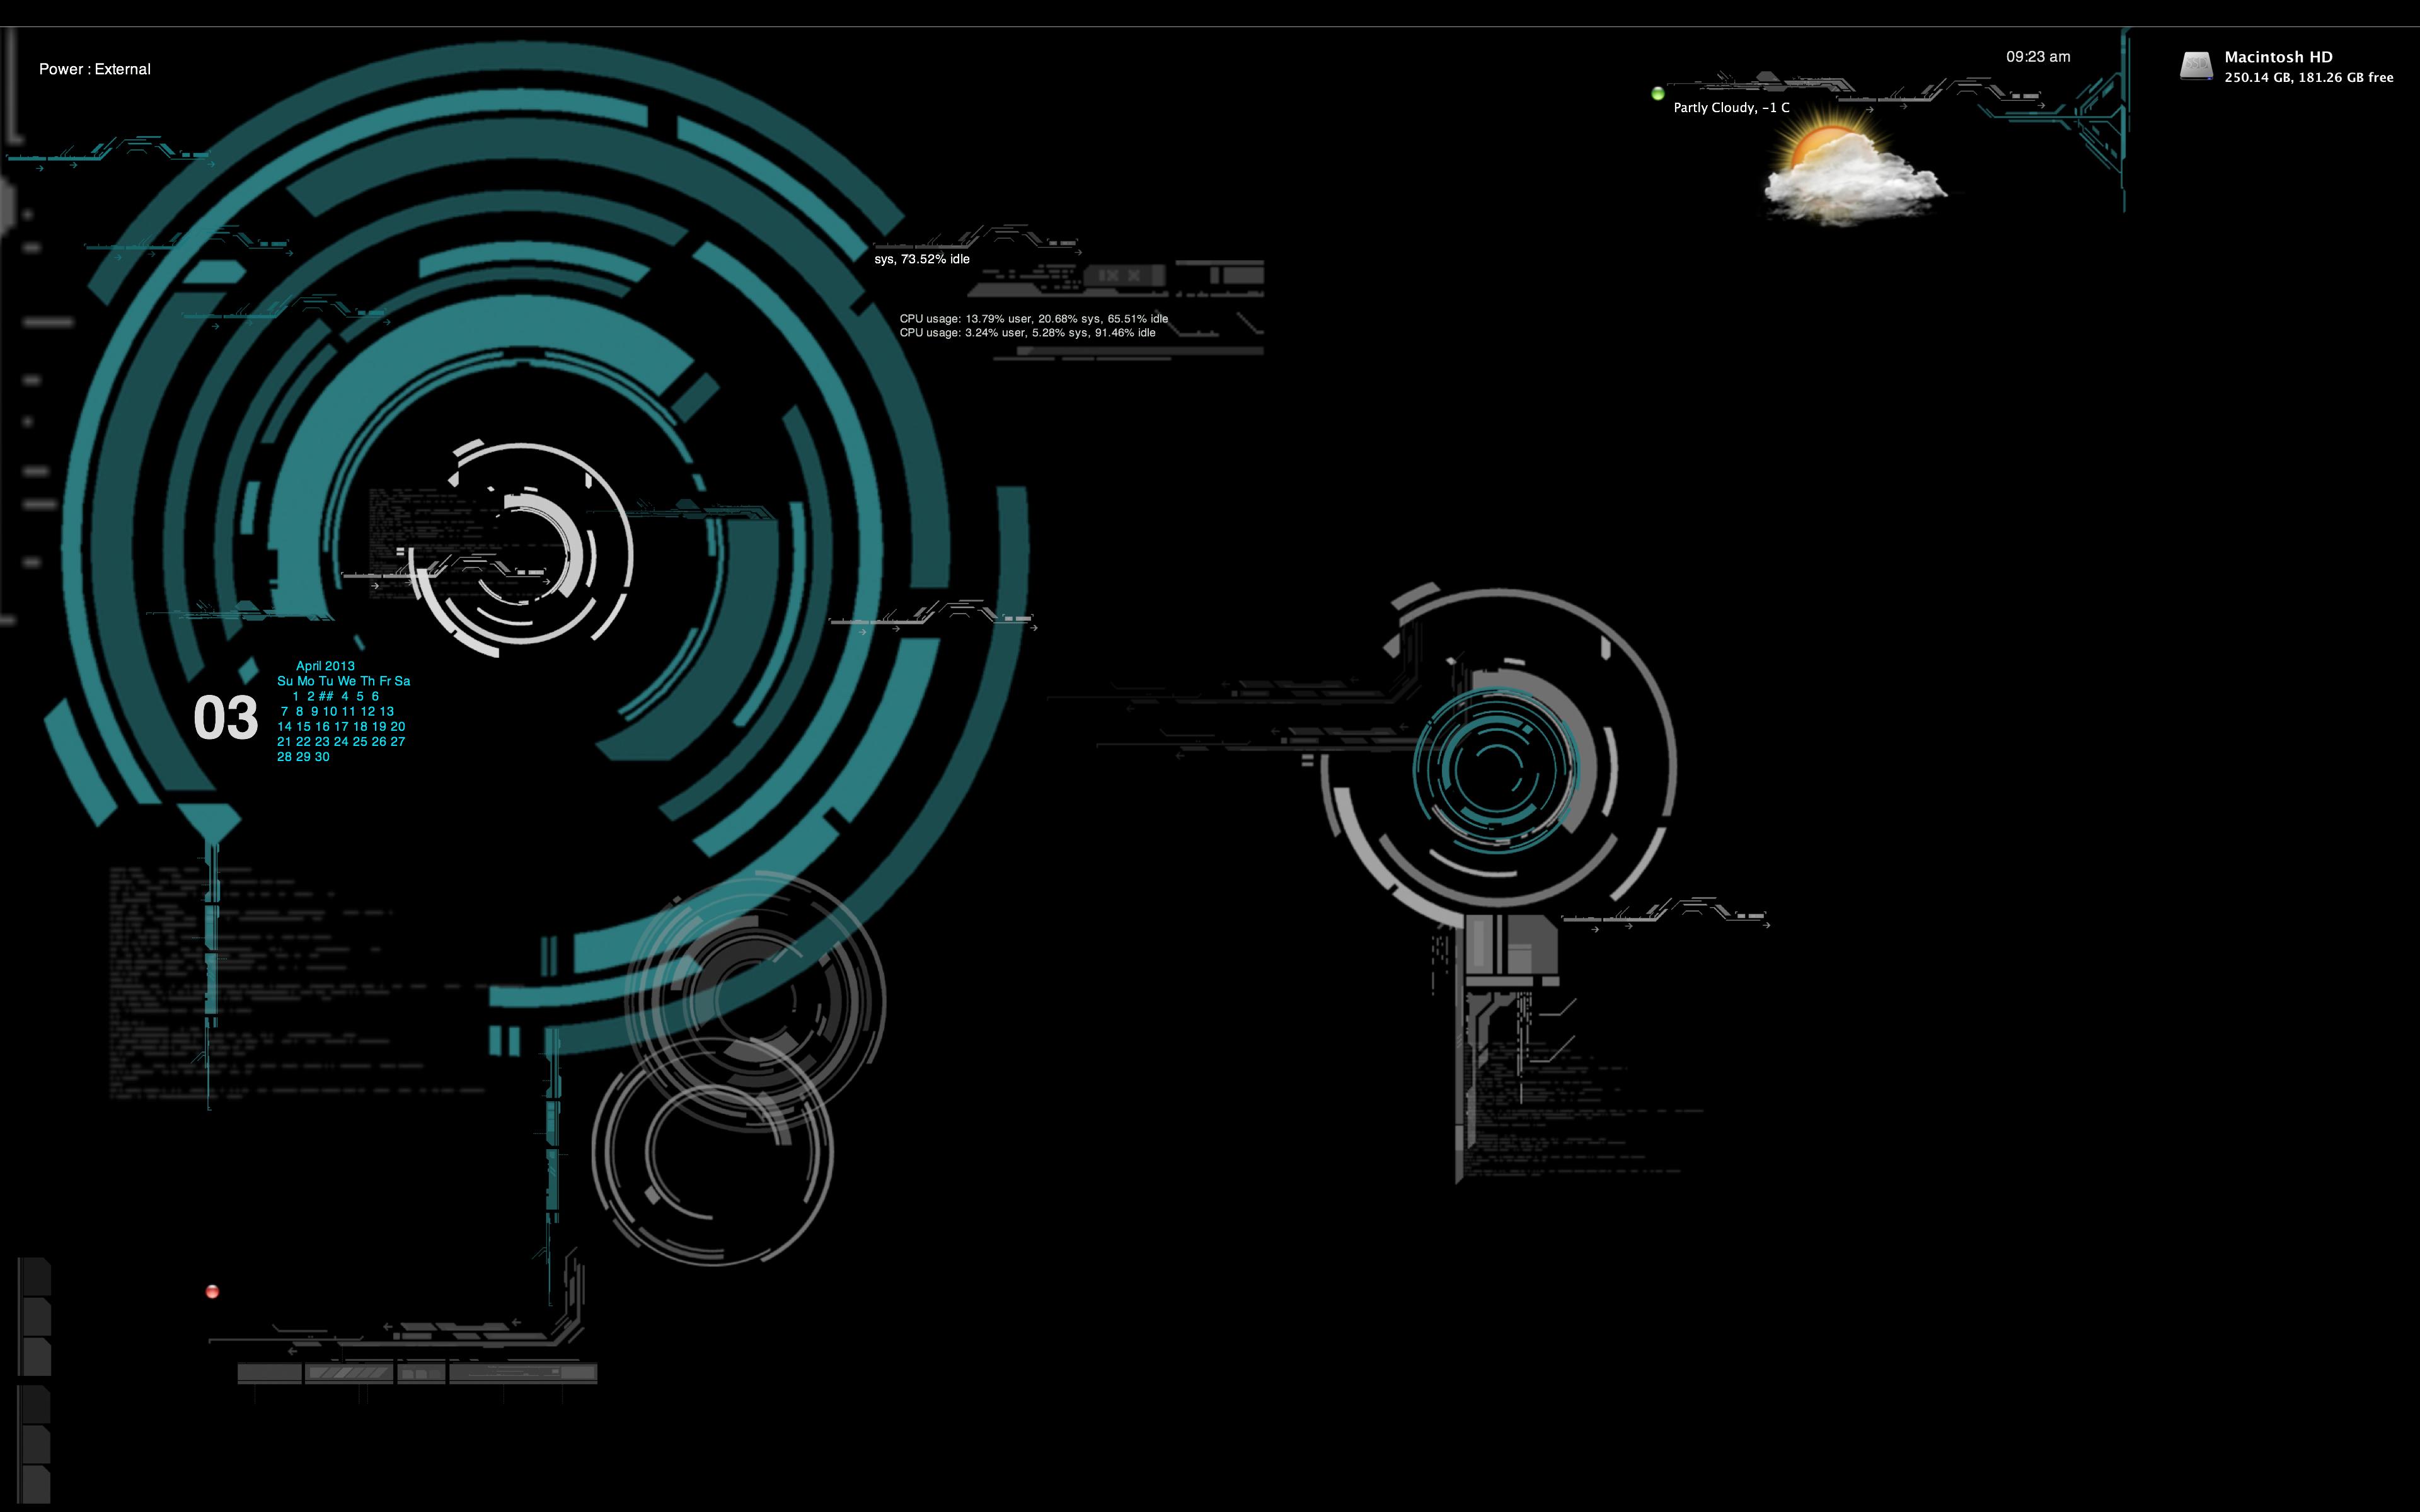 Screen Shot 2013 04 03 At 09 23 21 Png 3840 2400 Futuristic Technology Technology Background Futuristic